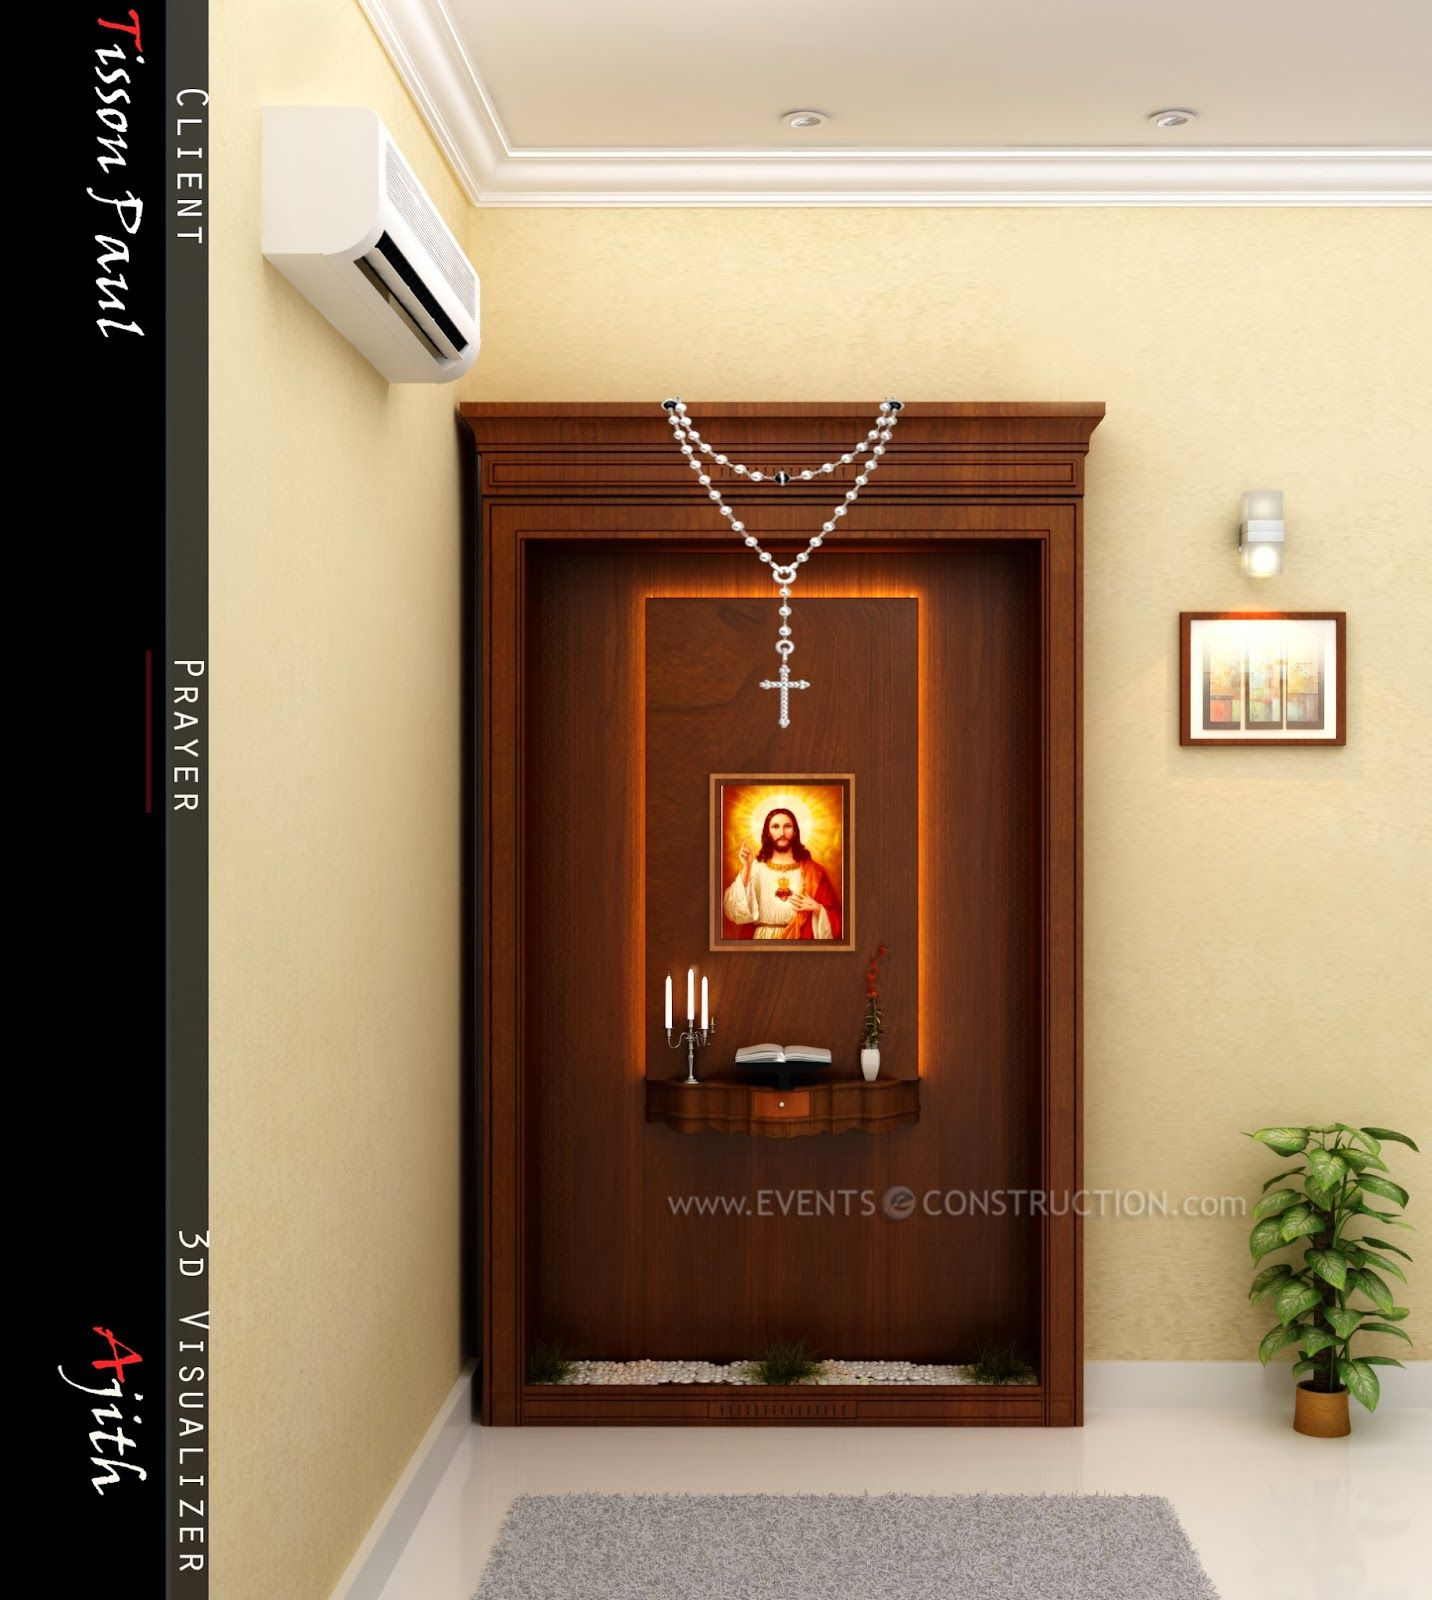 Prayer1 Jpg 1432 1600 Altar Design Prayer Room Home Altar Use them in commercial designs under lifetime, perpetual & worldwide rights. pinterest